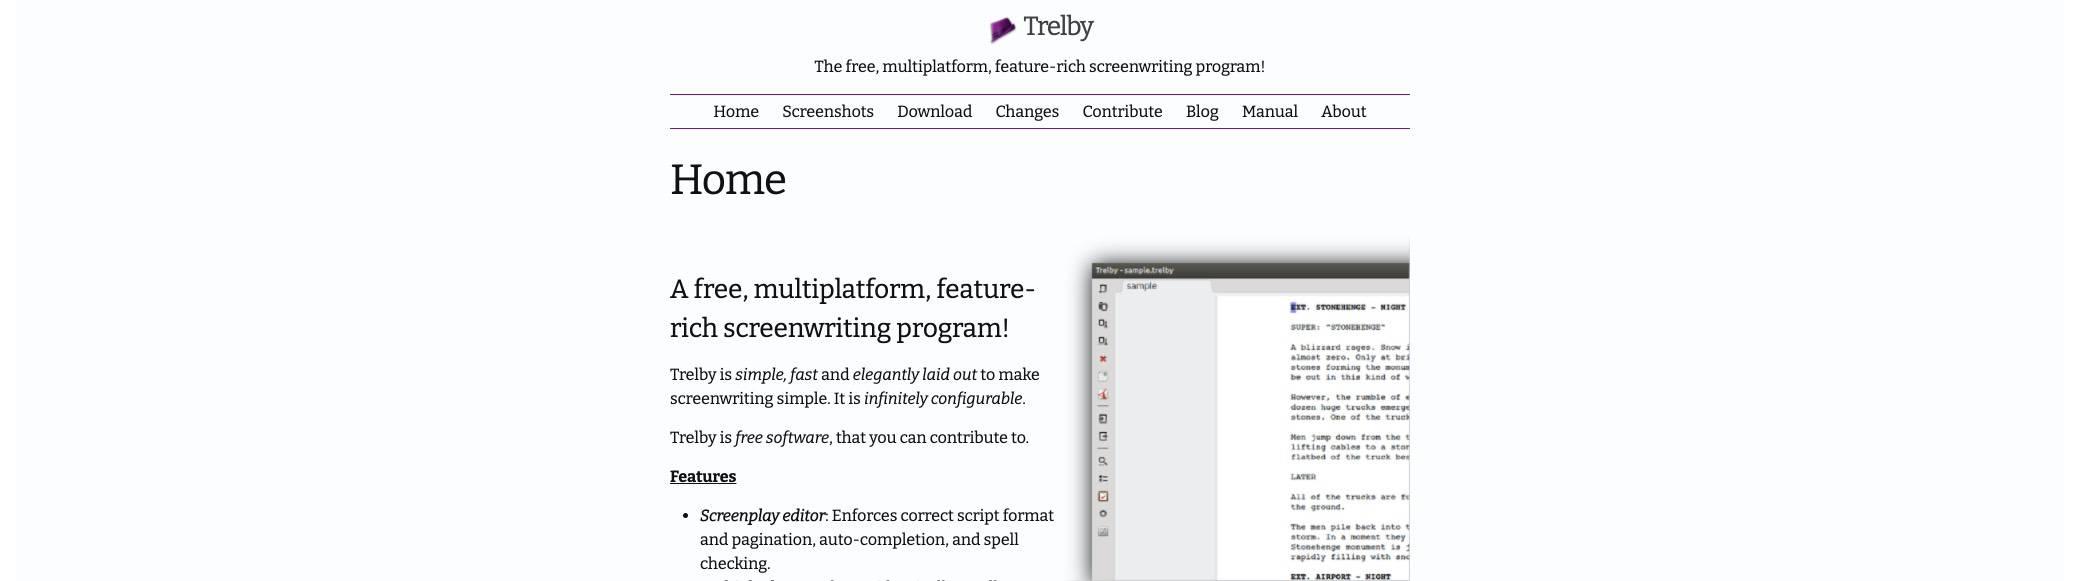 trelby screenshot